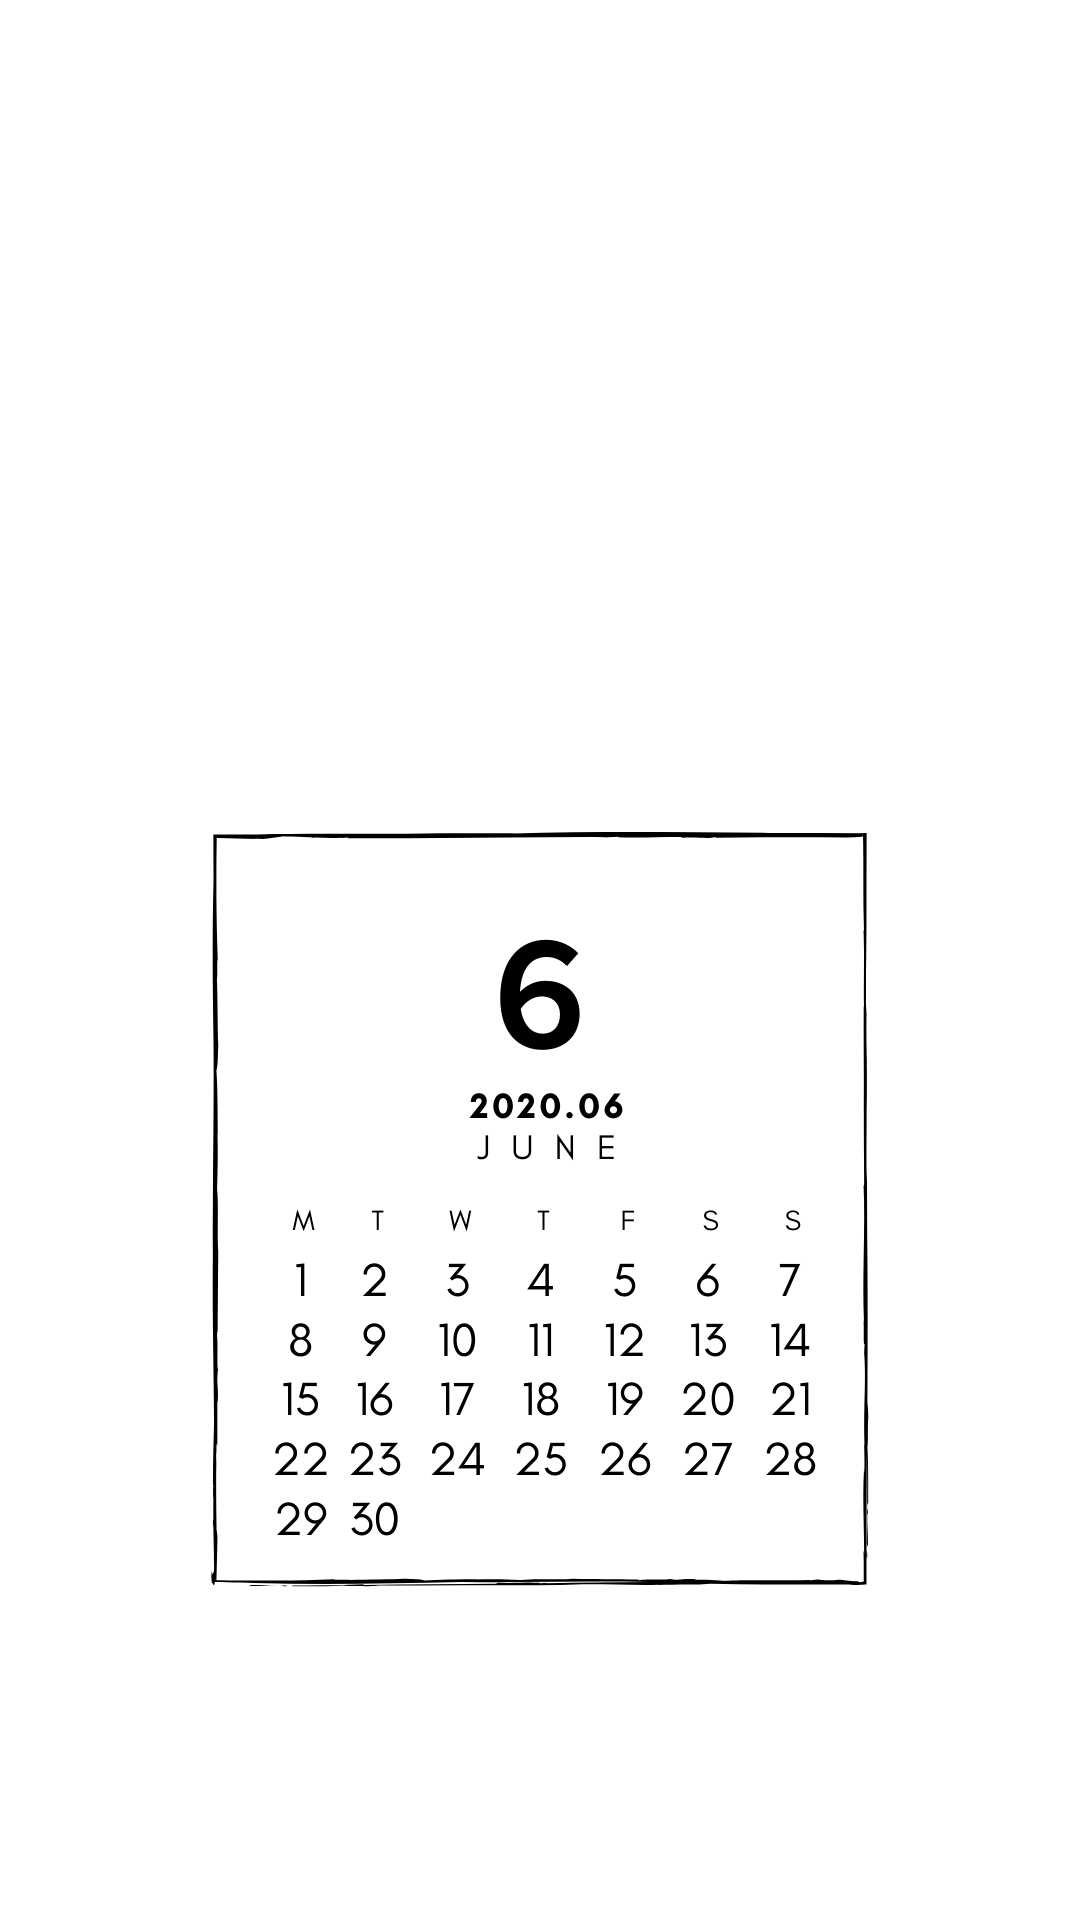 06calendar カレンダー シンプル 8月 カレンダー カレンダー